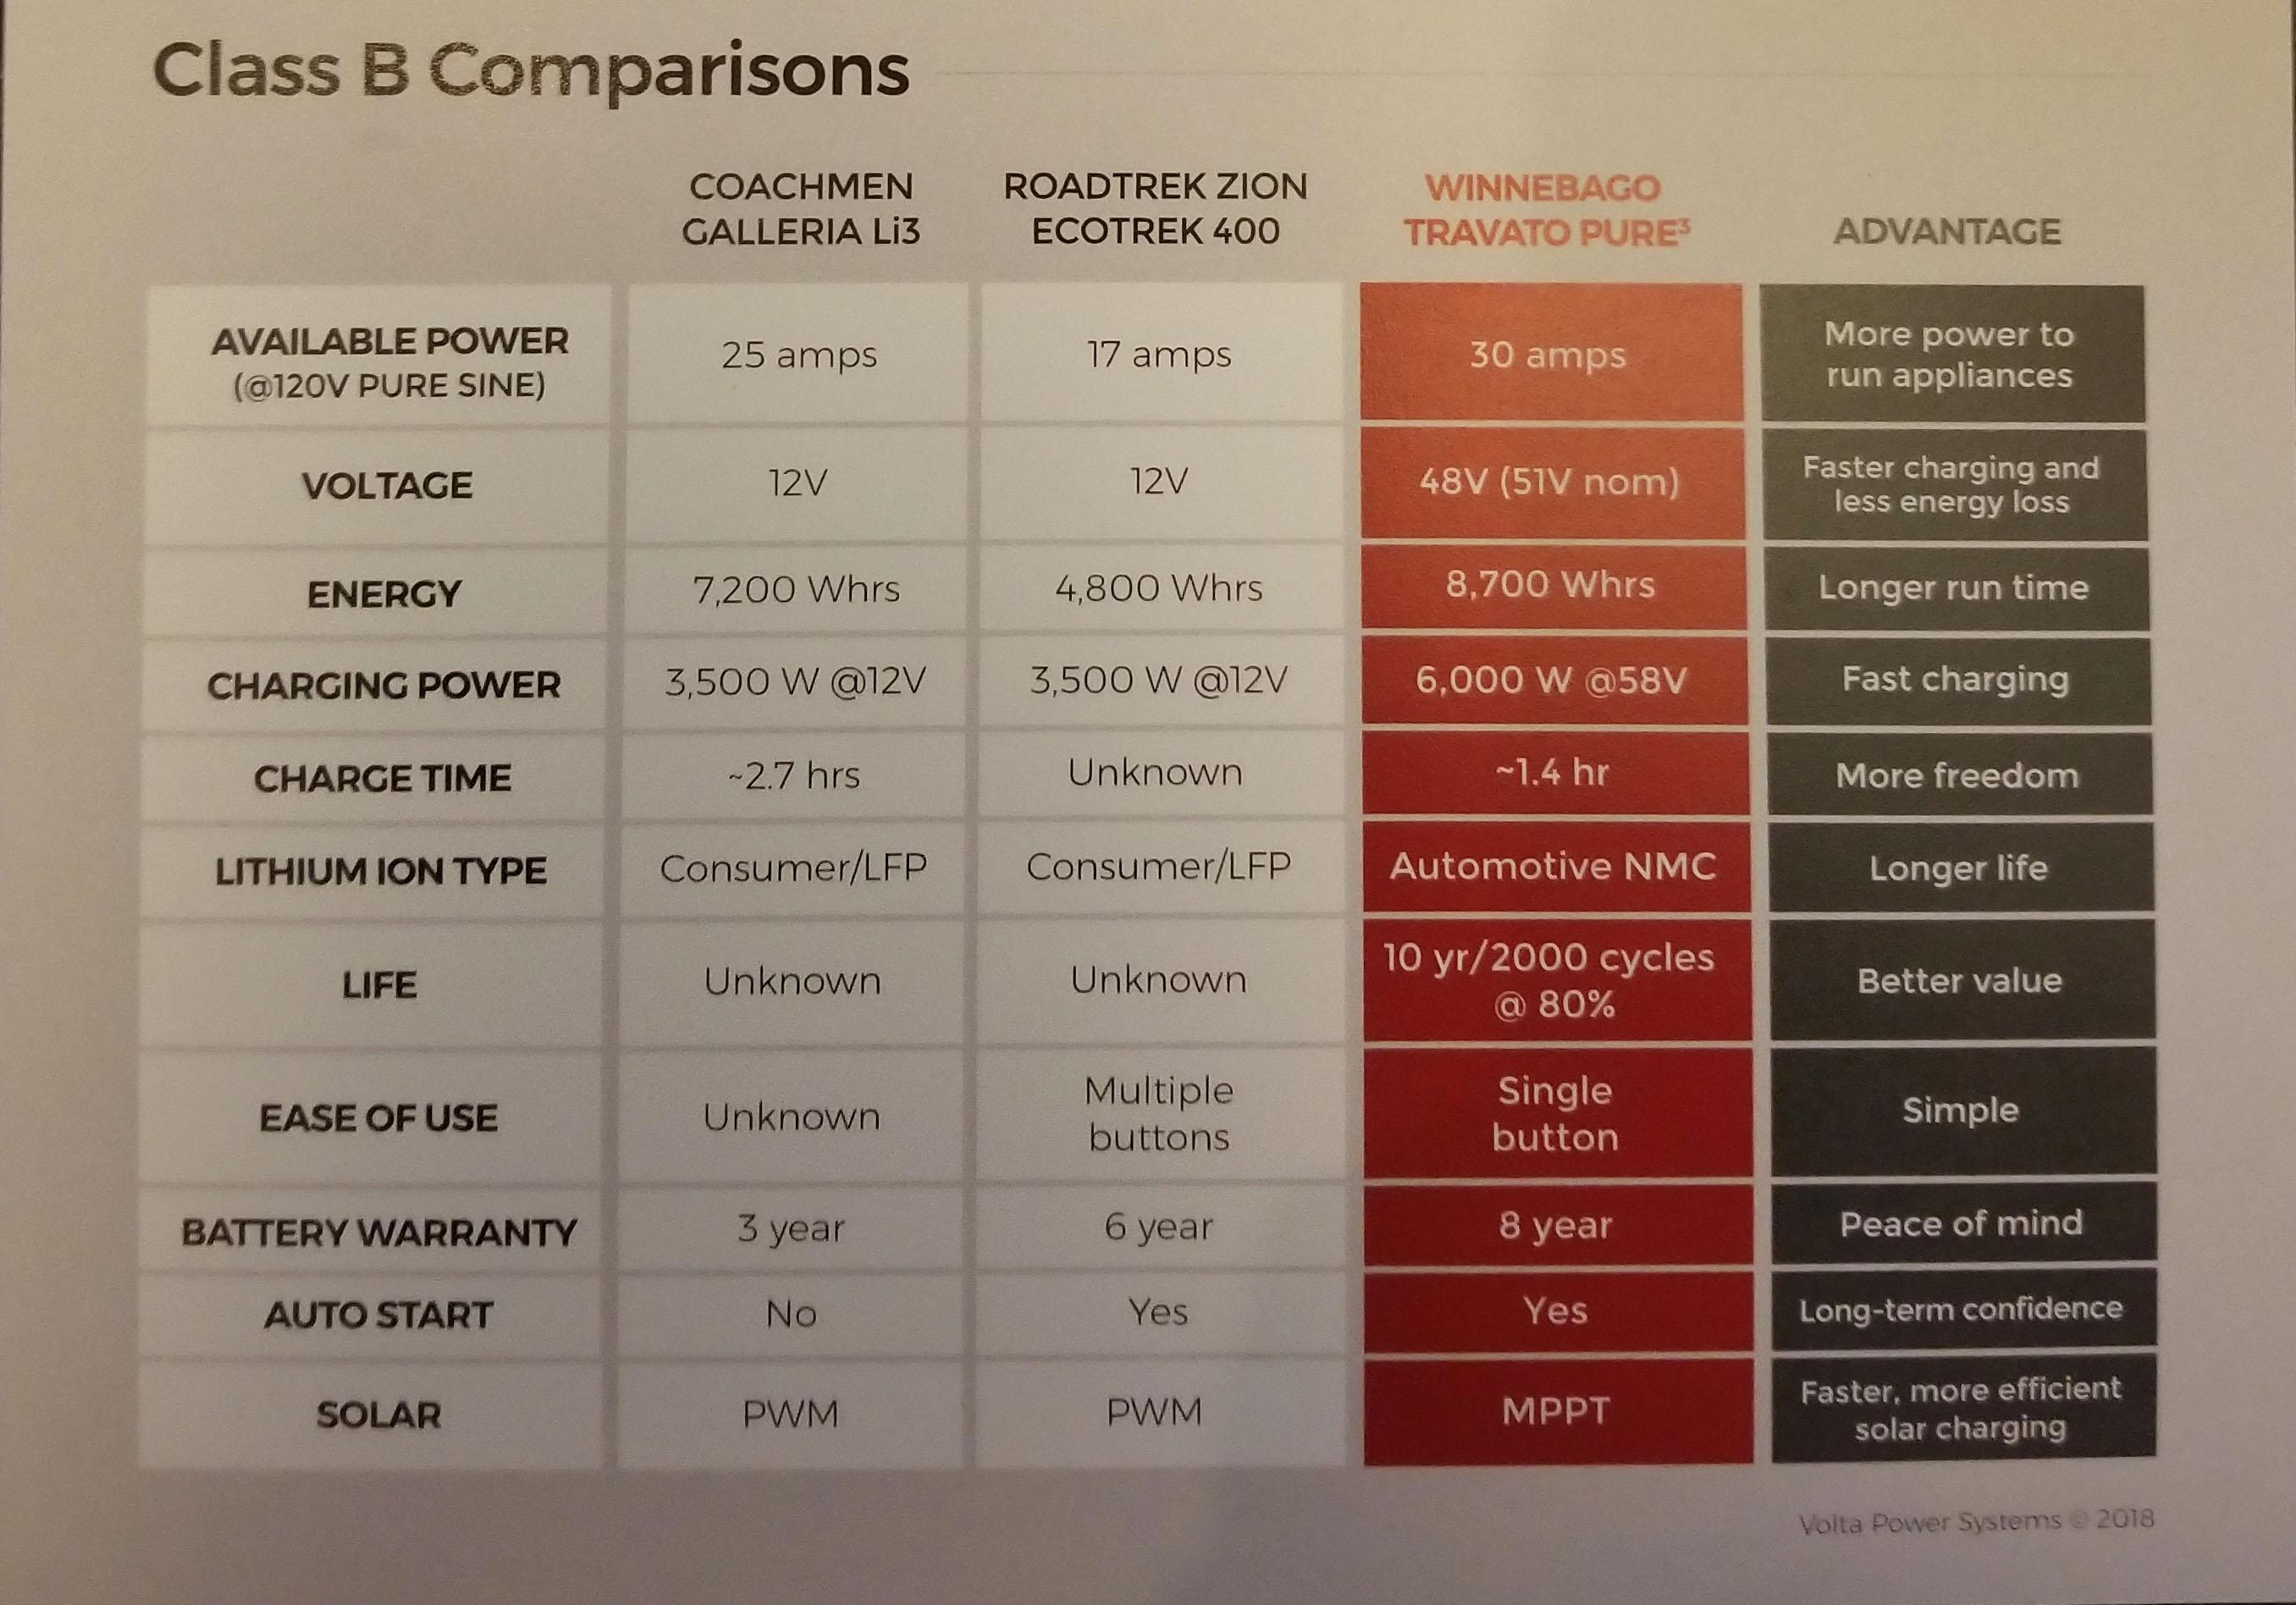 The Travato Pure3 Energy Management System vs. the Coachmen Galleria Li3 and the Roadtrek Zion EcoTrek 400